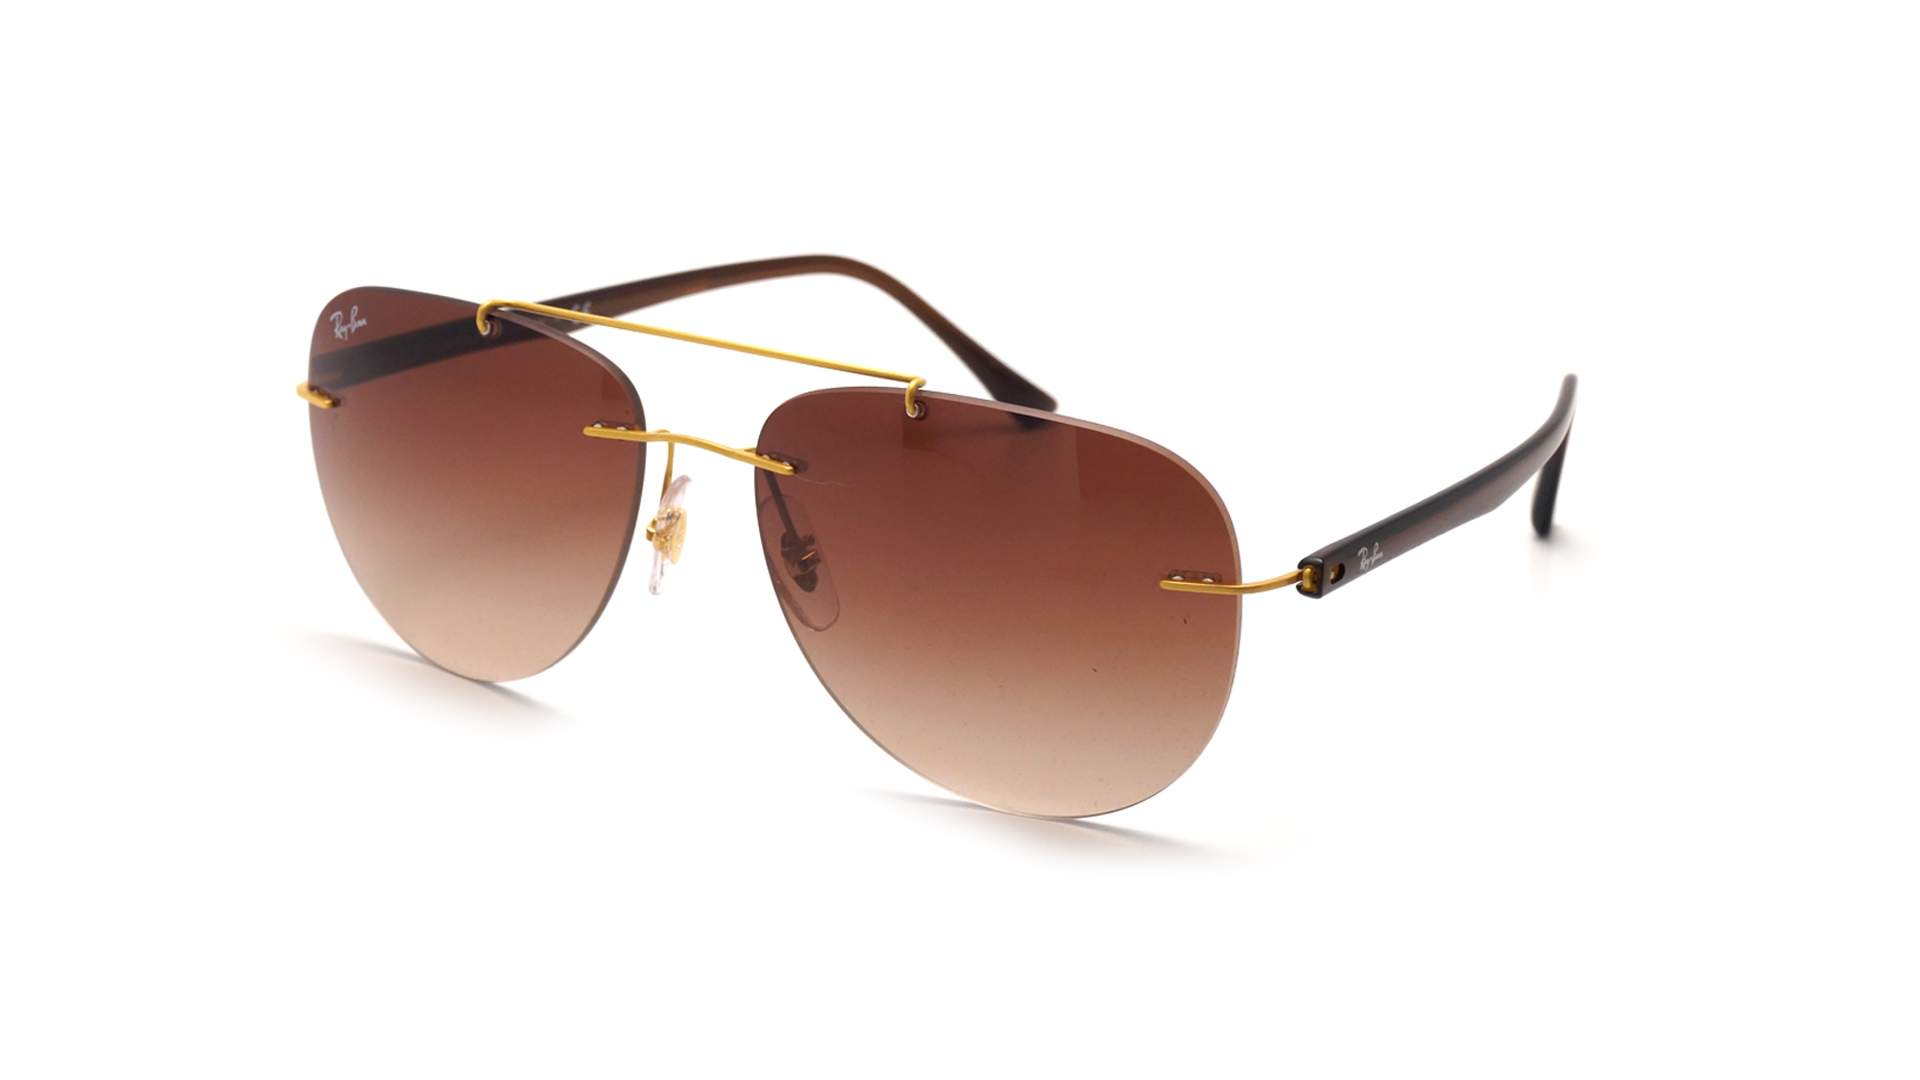 Sunglasses Ray-Ban Light ray Yellow RB8059 157 13 57-16 Medium Gradient 8b4c73b758a9